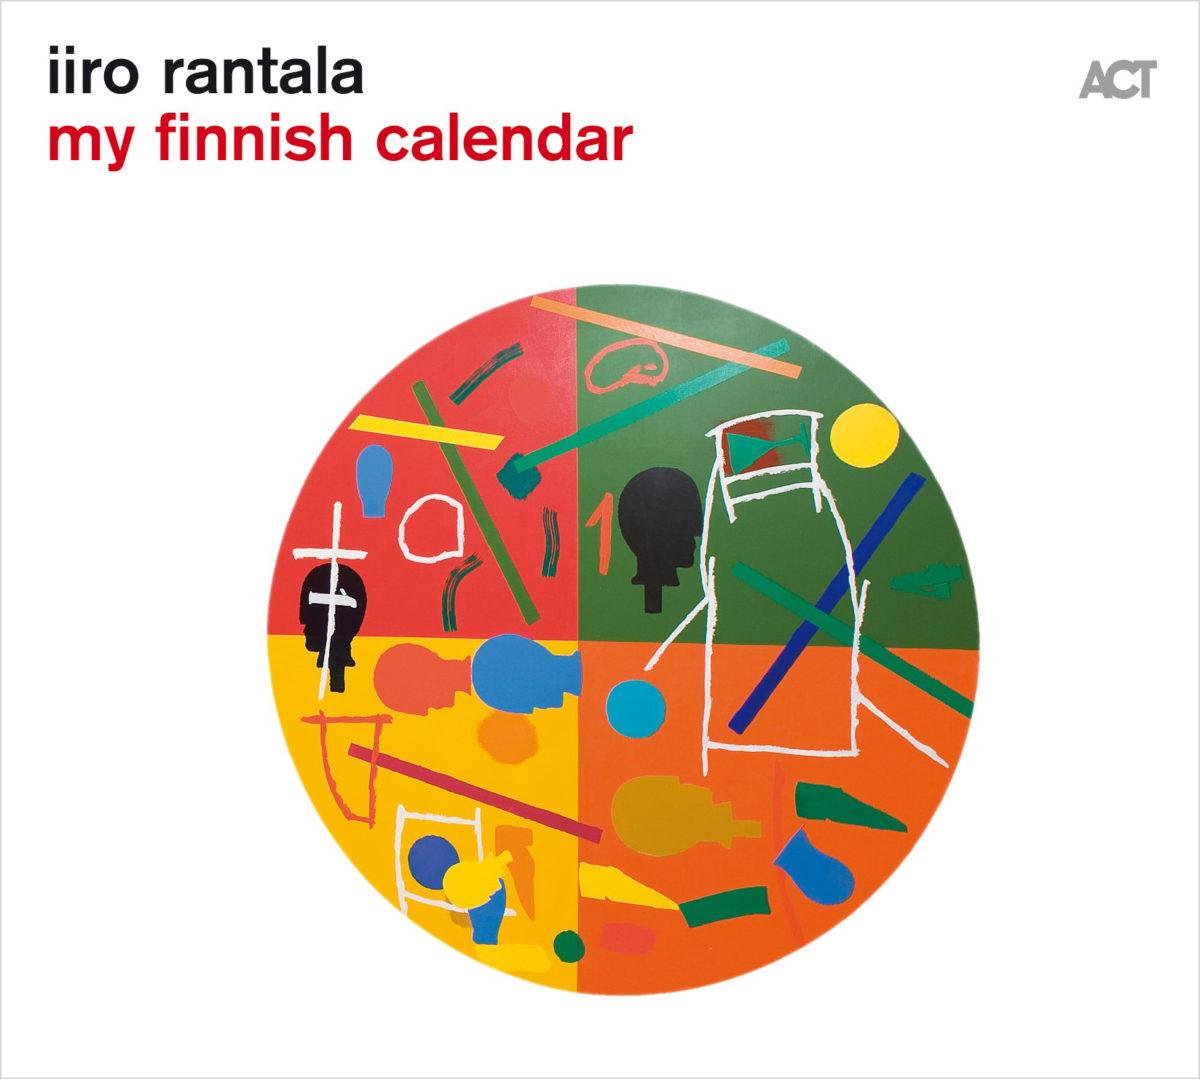 Iiro Rantala: My Finnish Calendar. ACT, 2019.